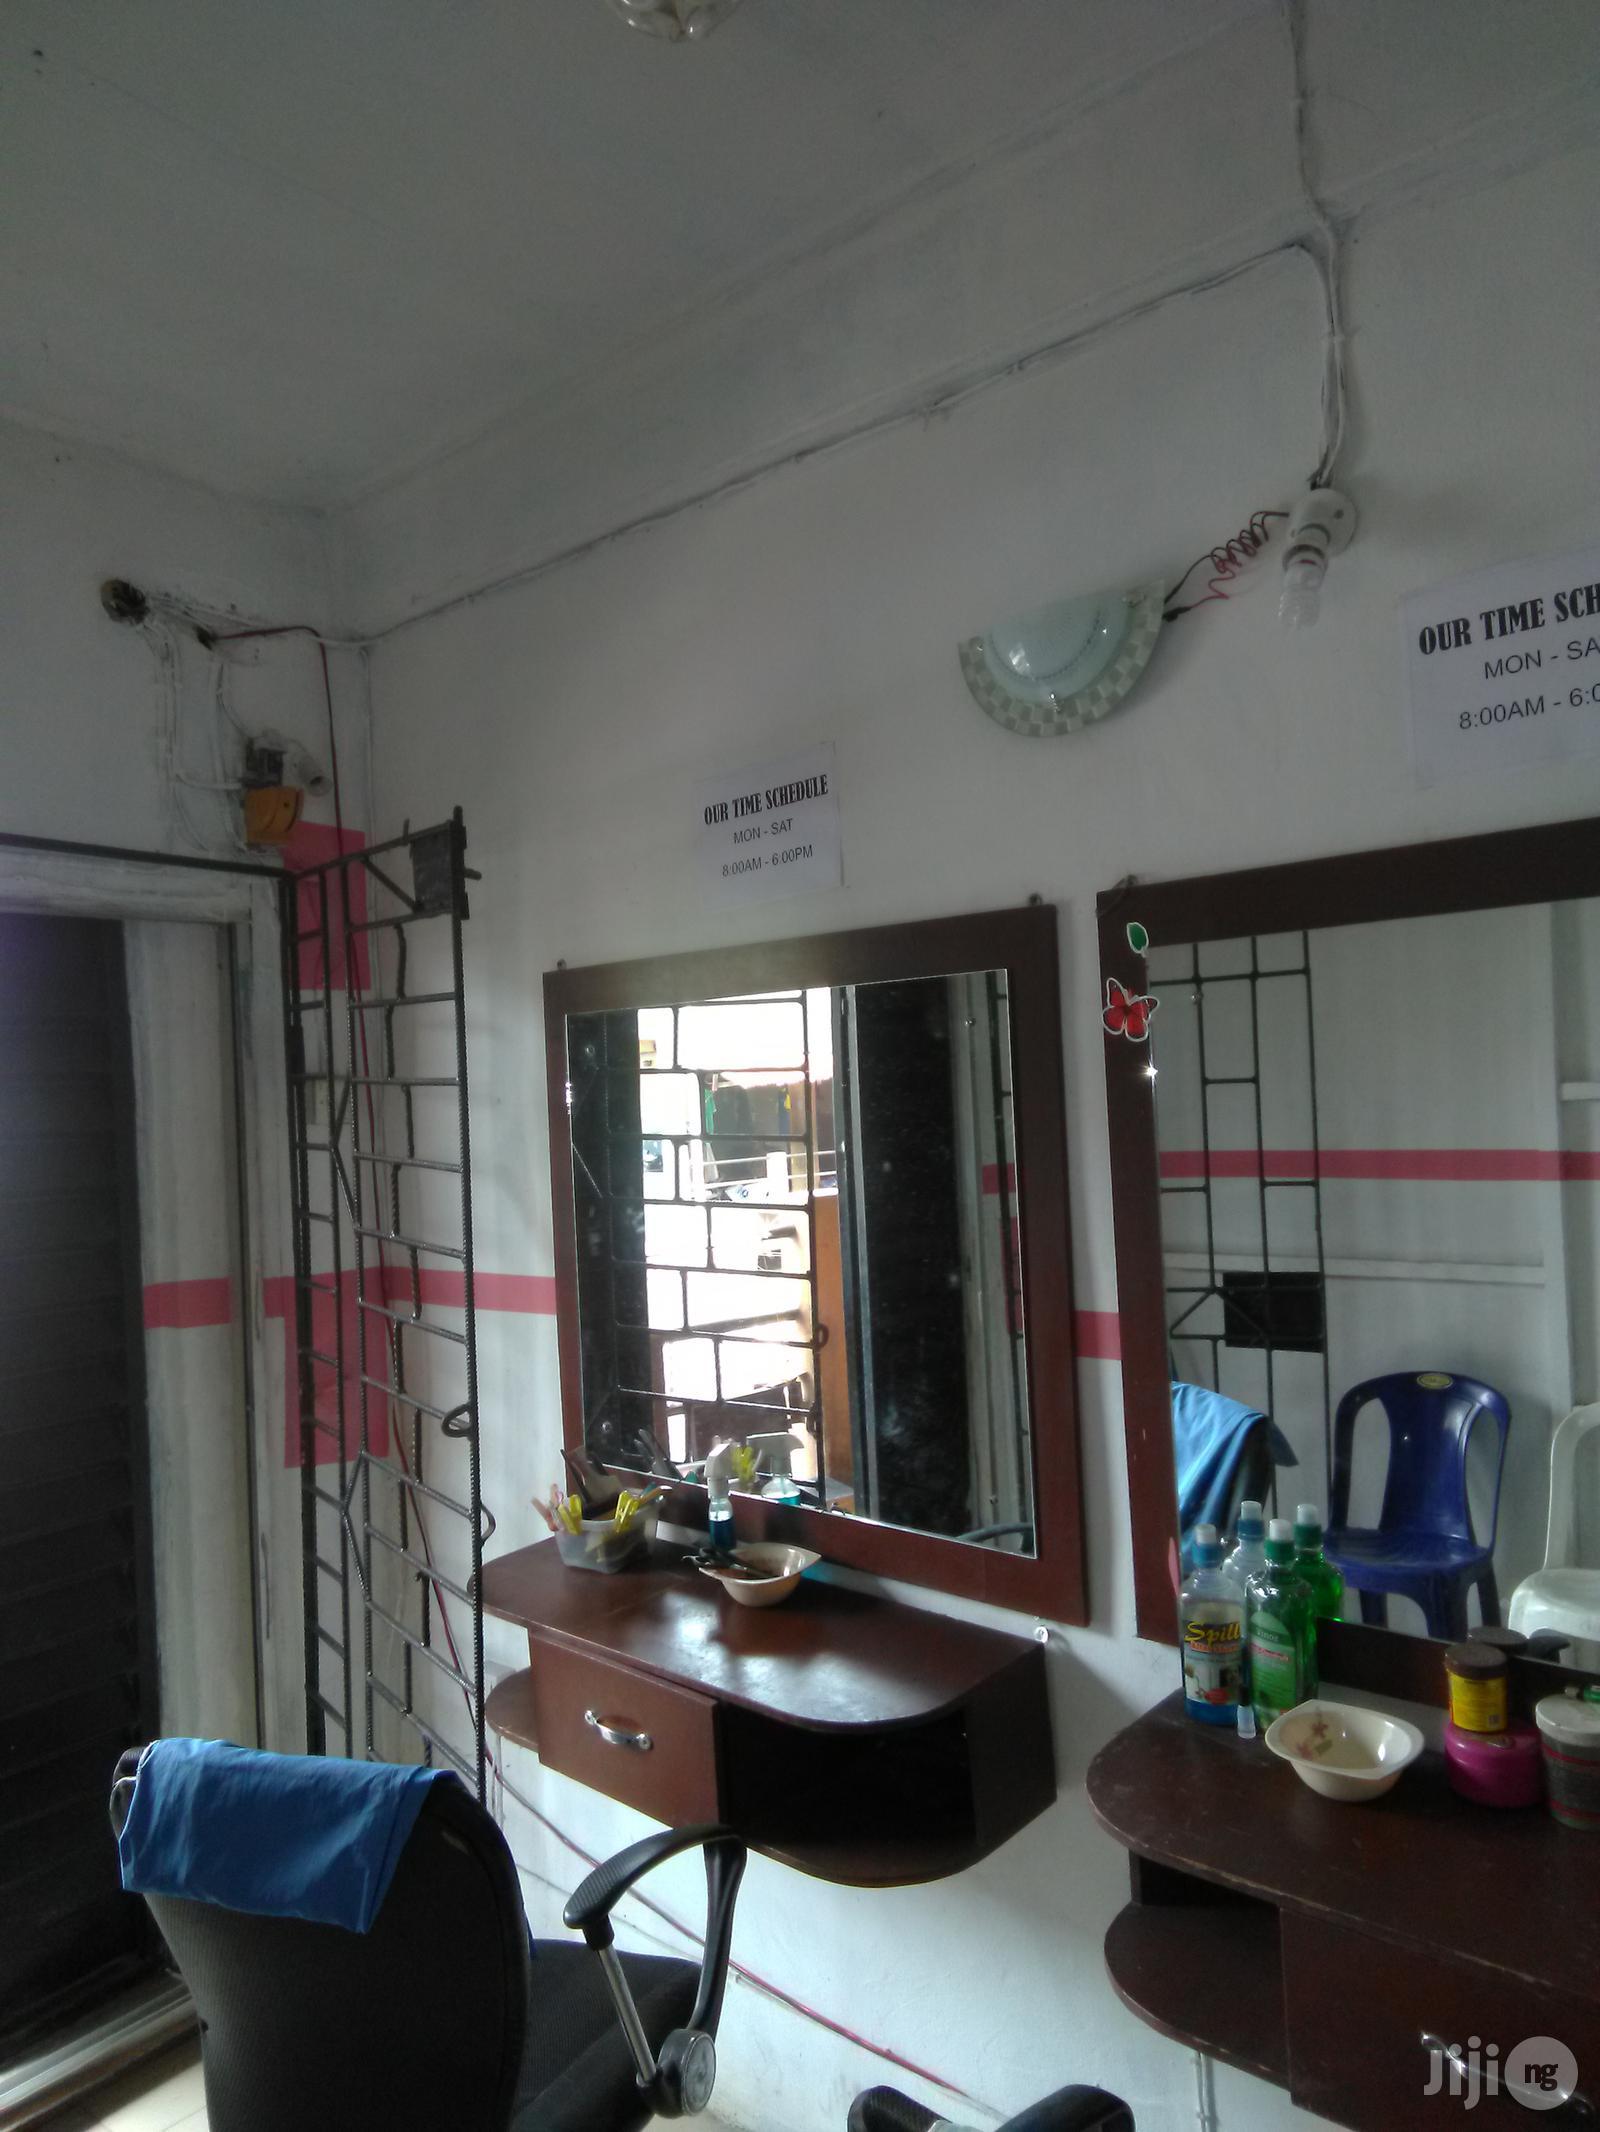 Barbering Shelves And Mirror | Salon Equipment for sale in Ikorodu, Lagos State, Nigeria